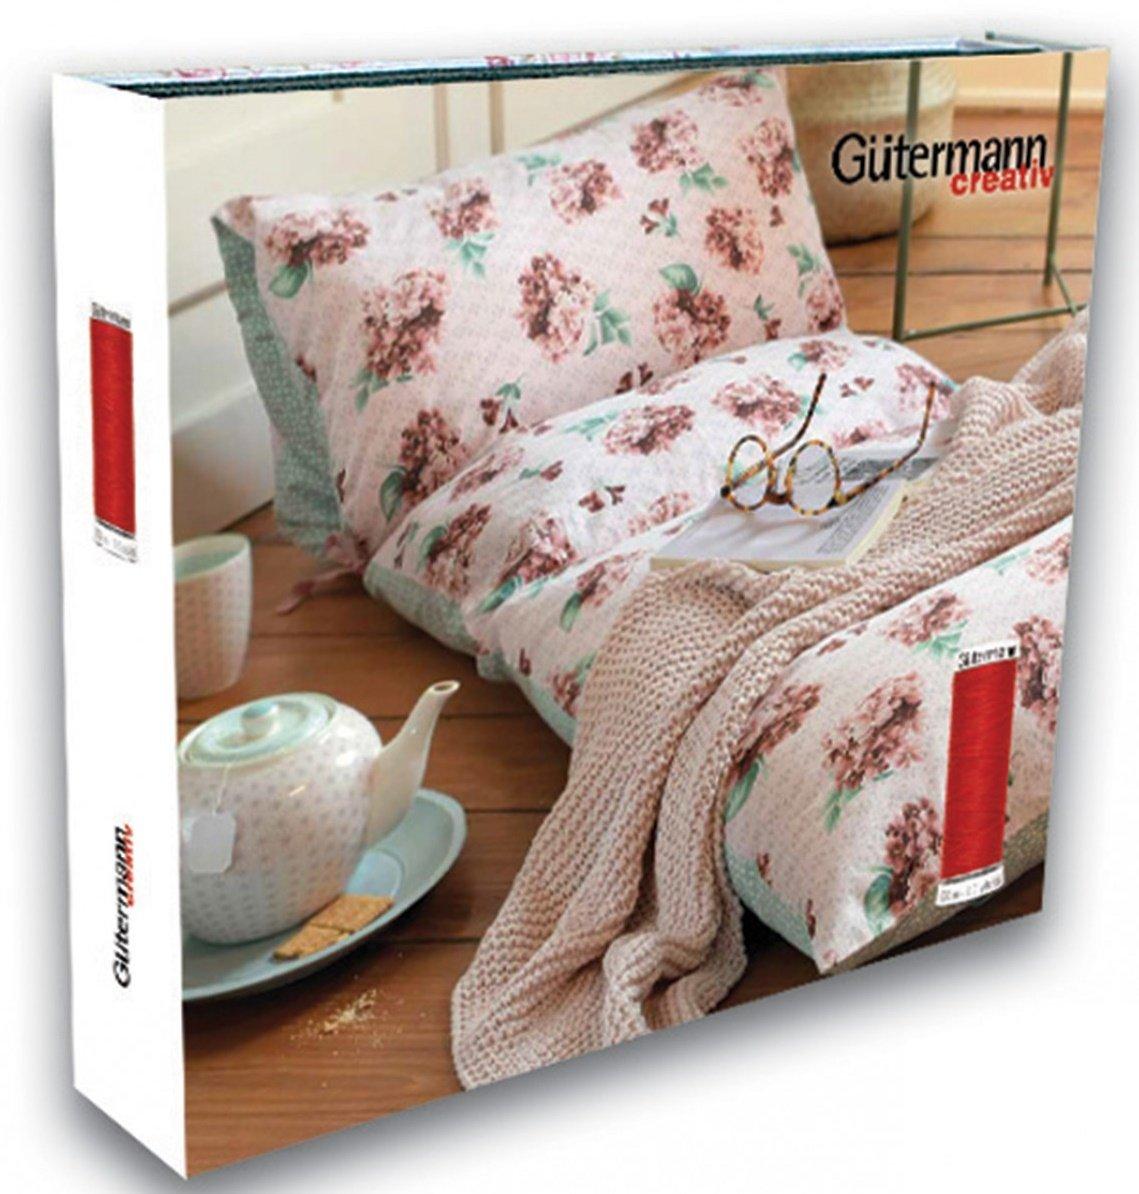 Gutermann Creativ Thread - 700895 Sew-All Thread Notebook